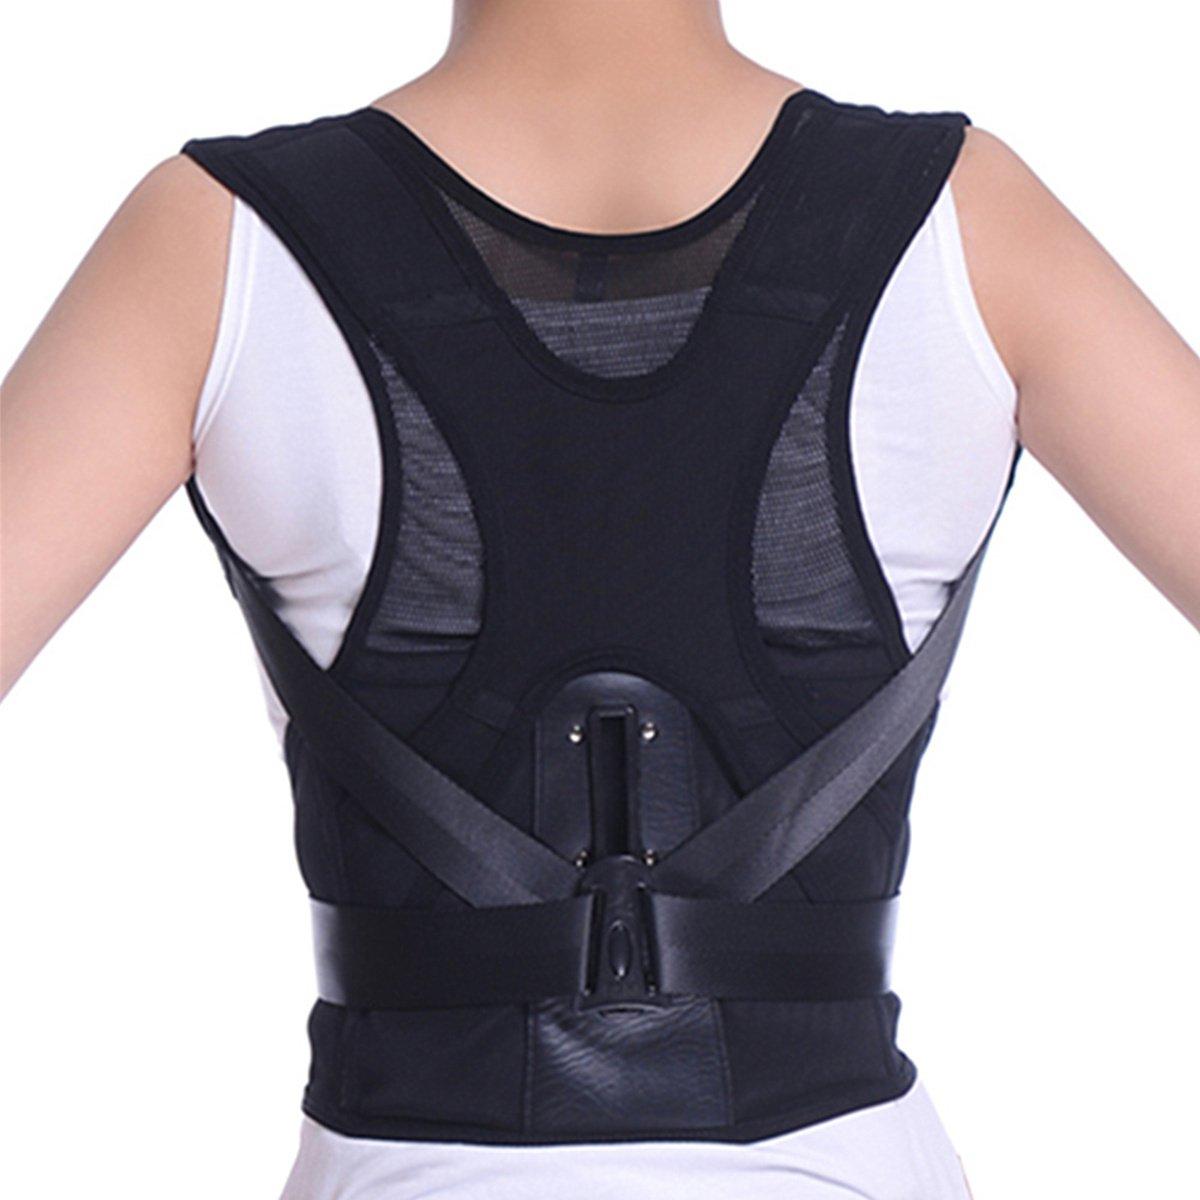 Tcare Adjustable Posture Corrector Waist Shoulder Brace Back Support, Back Lumbar Pain Relief Belt (M) by Tcare